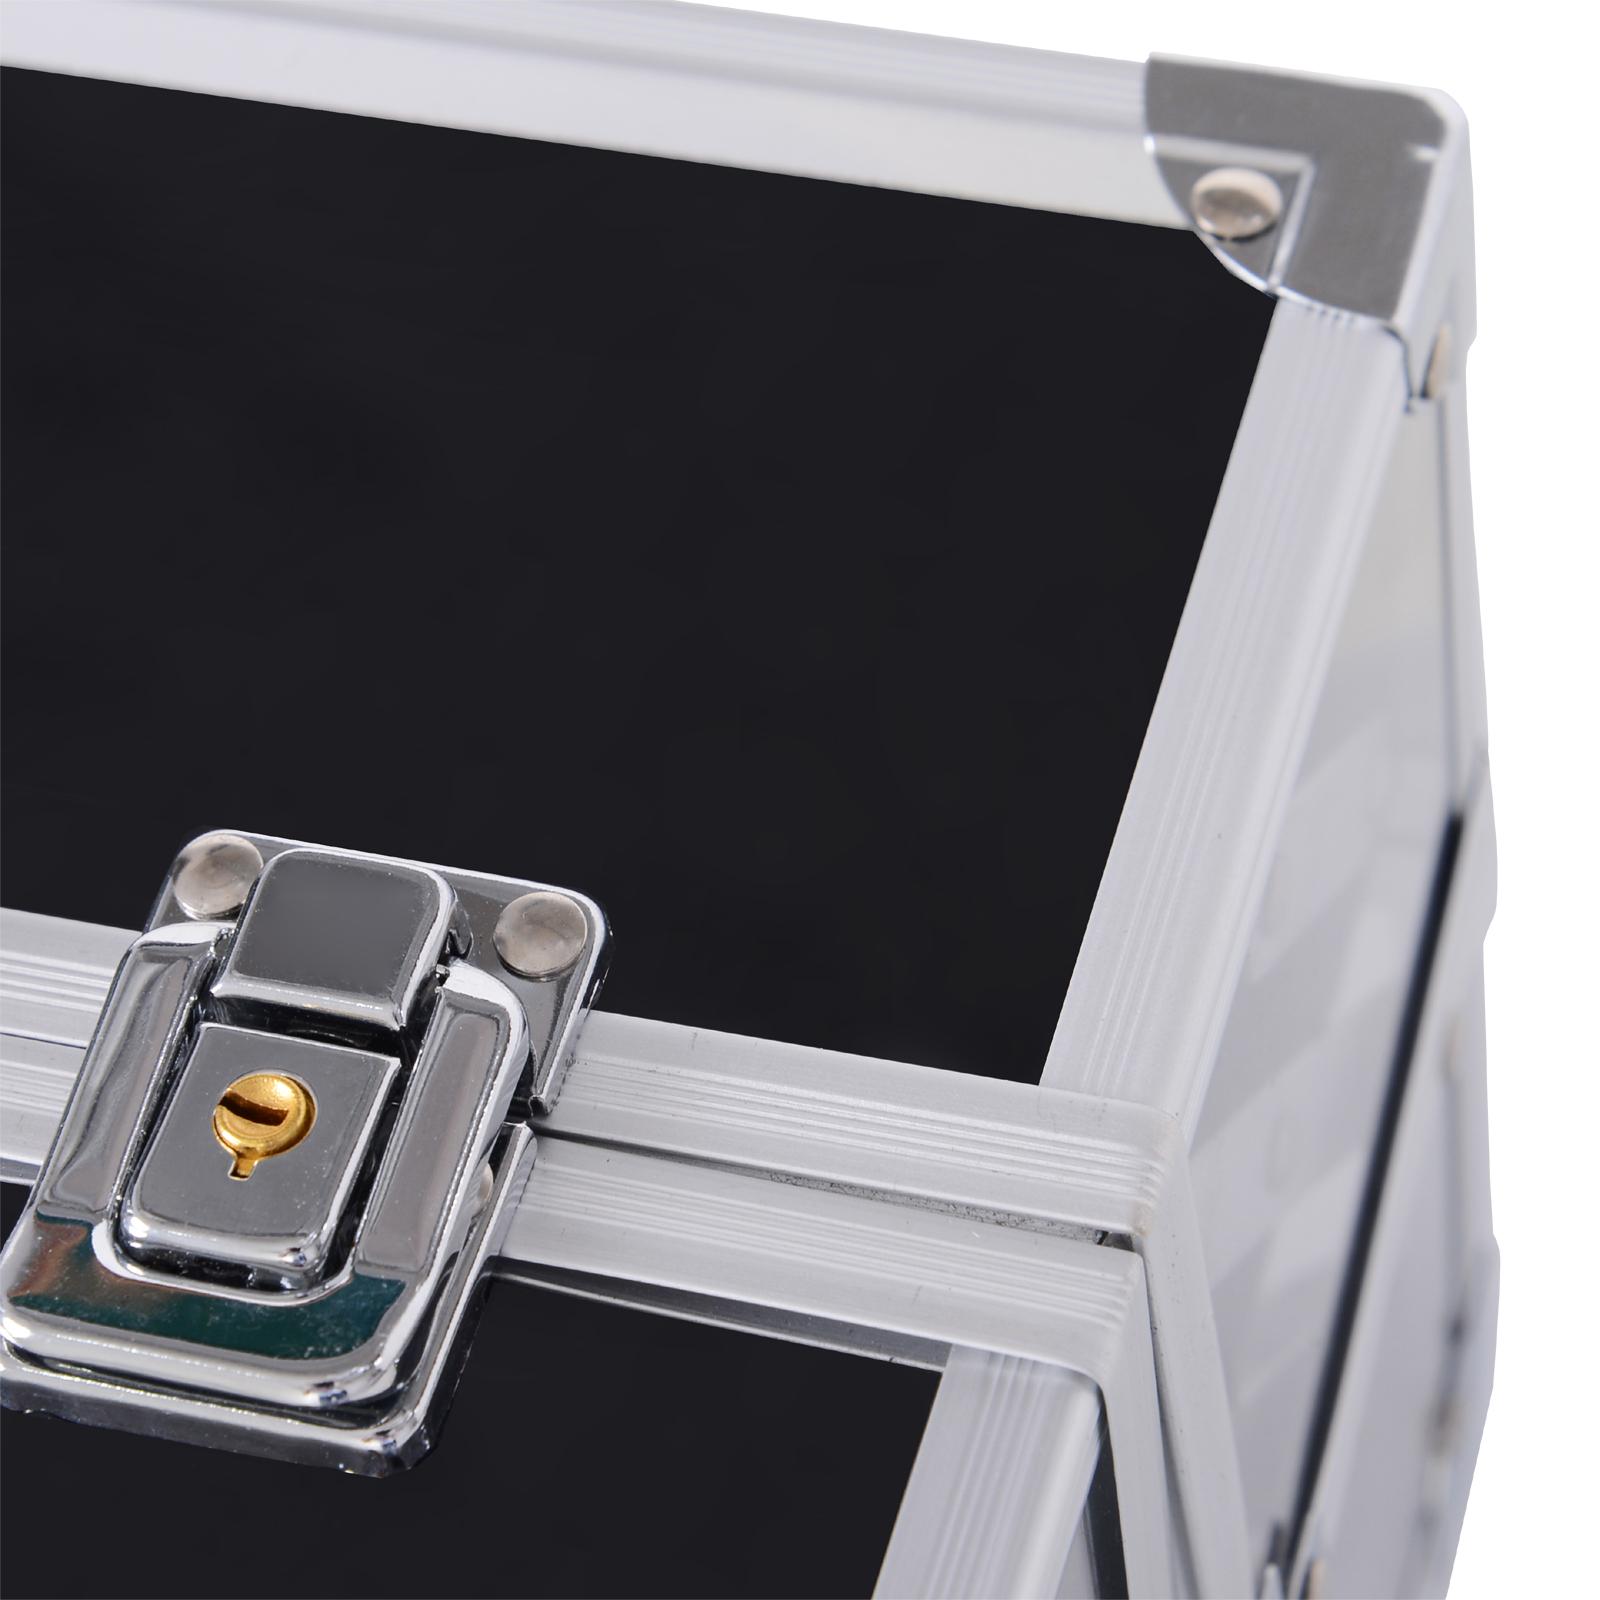 Portable-Makeup-Case-Train-Case-Lockable-Aluminum-with-4-Trays thumbnail 25